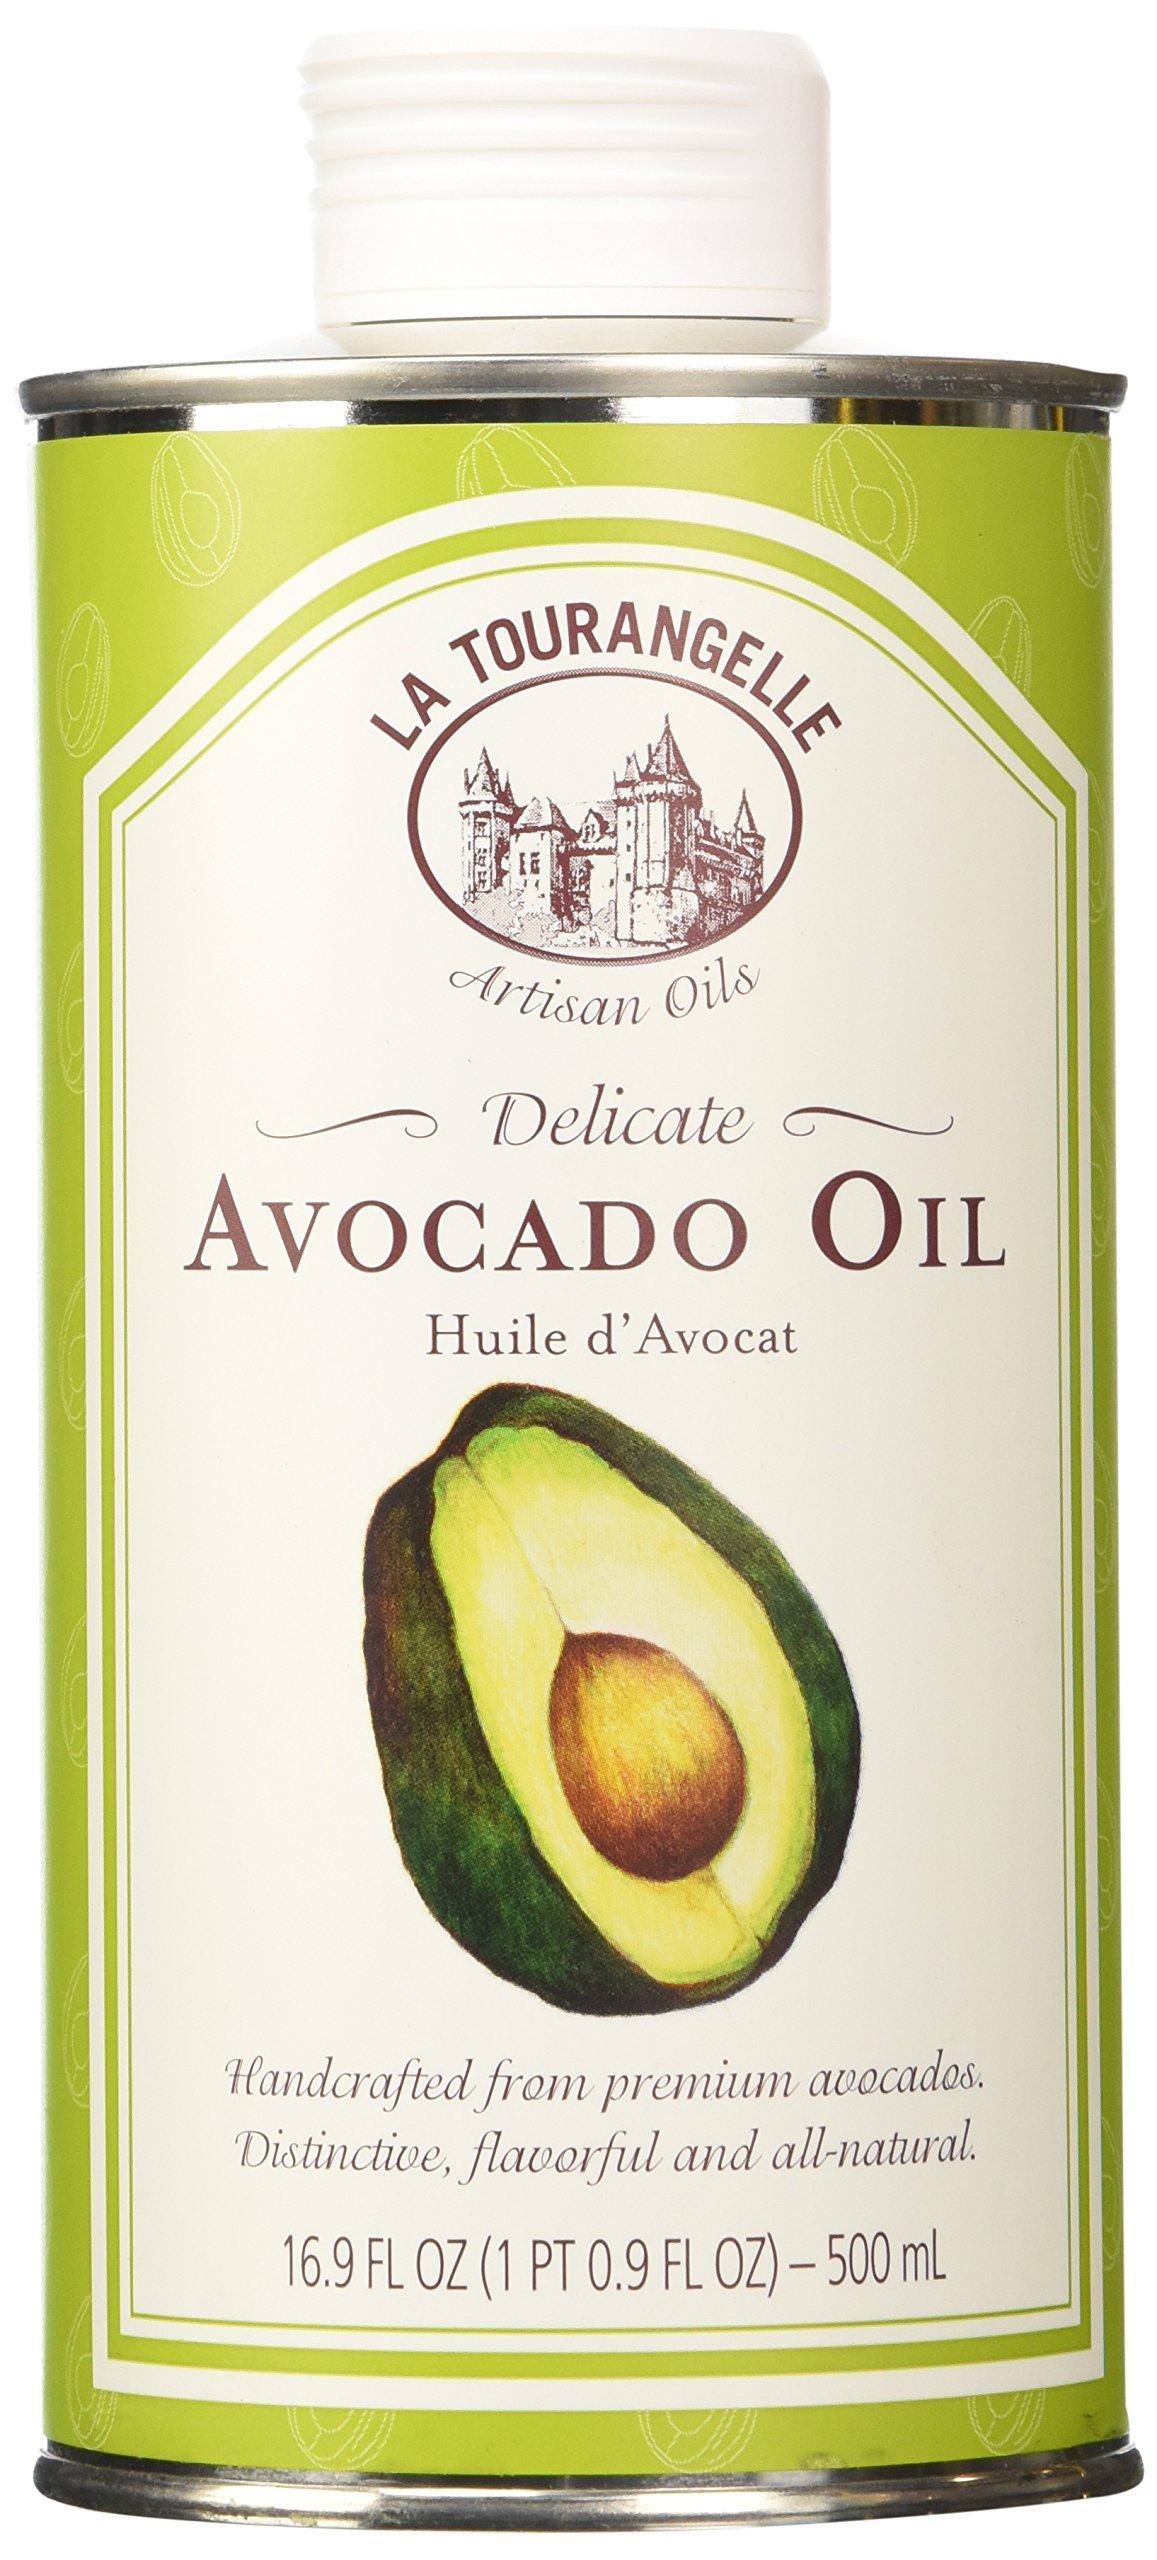 La Tourangelle Avocado Oil, 16.9 Ounce Tin - Pack of 3